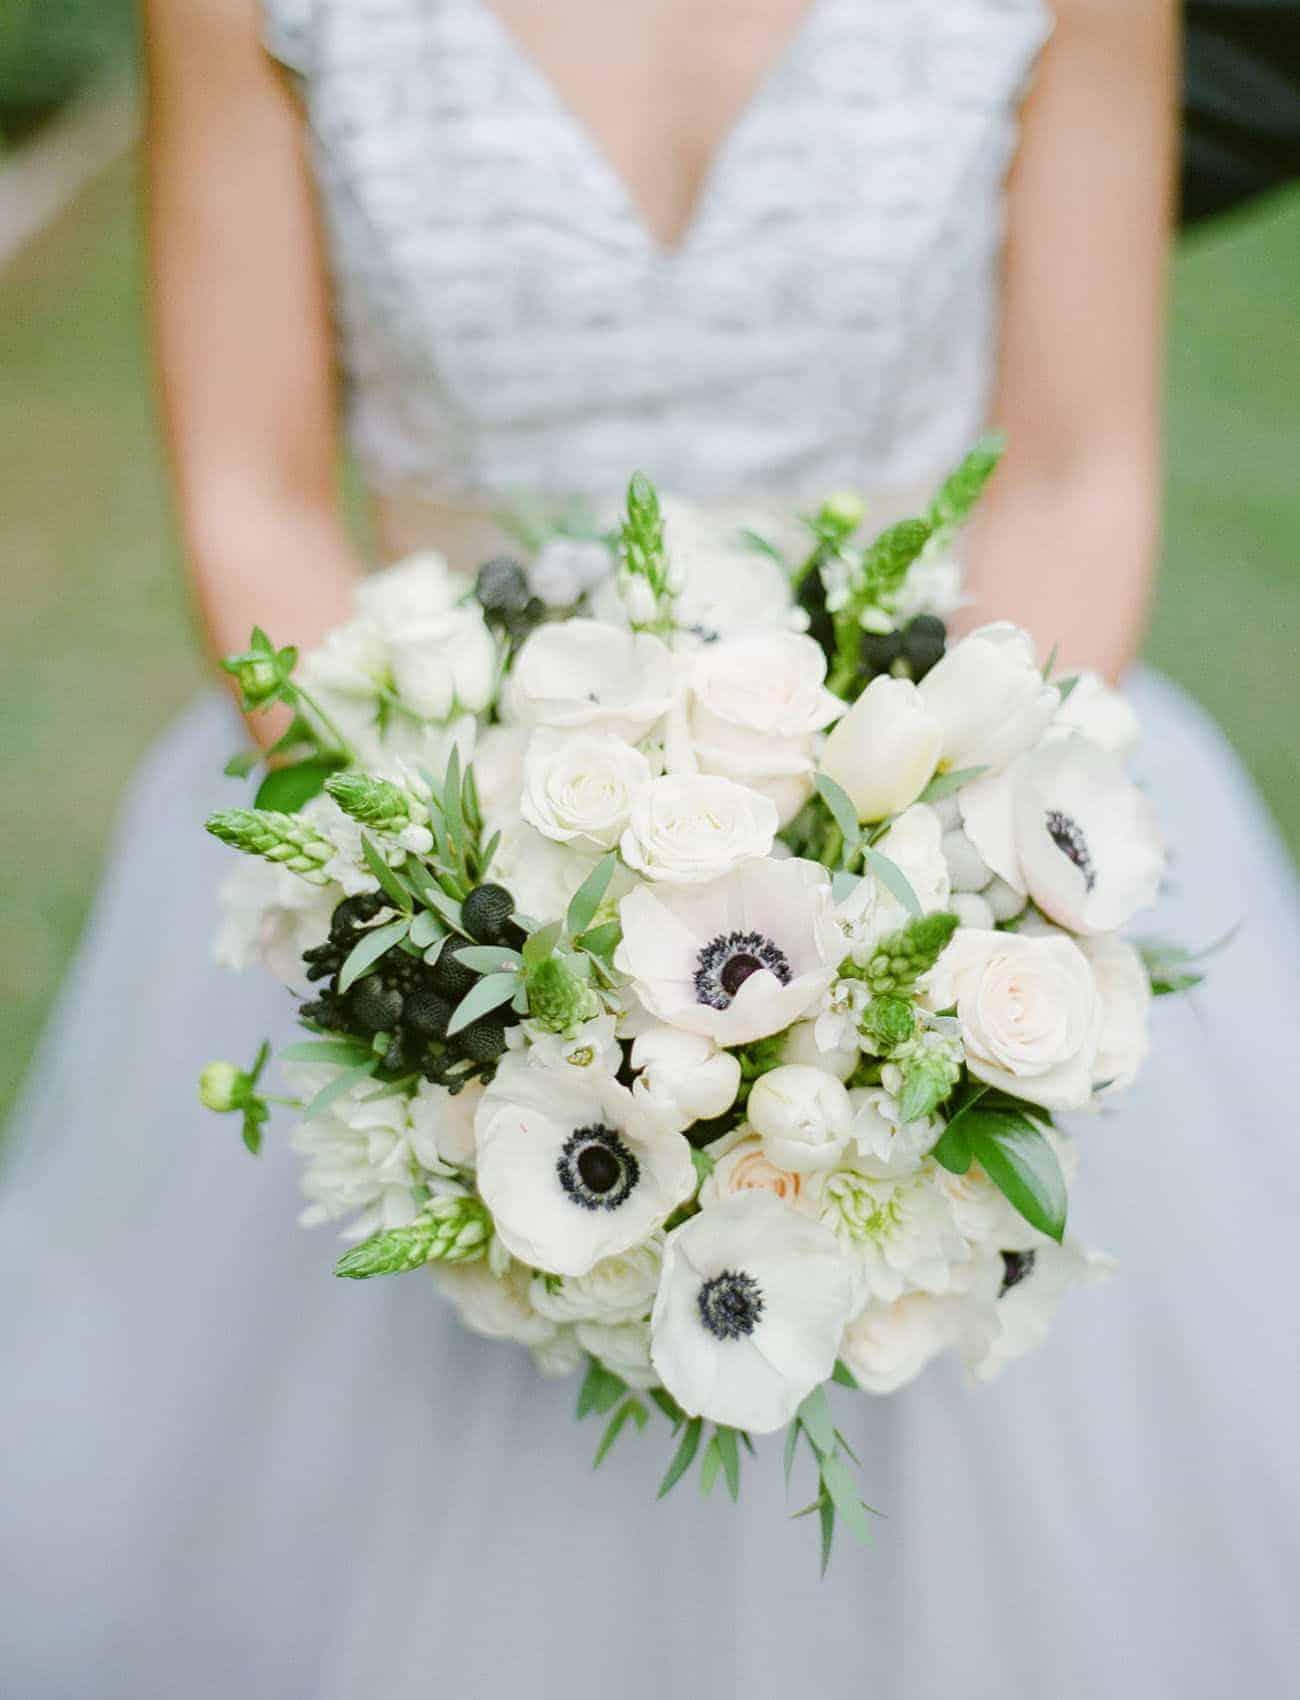 wedding bouquet with white anemones